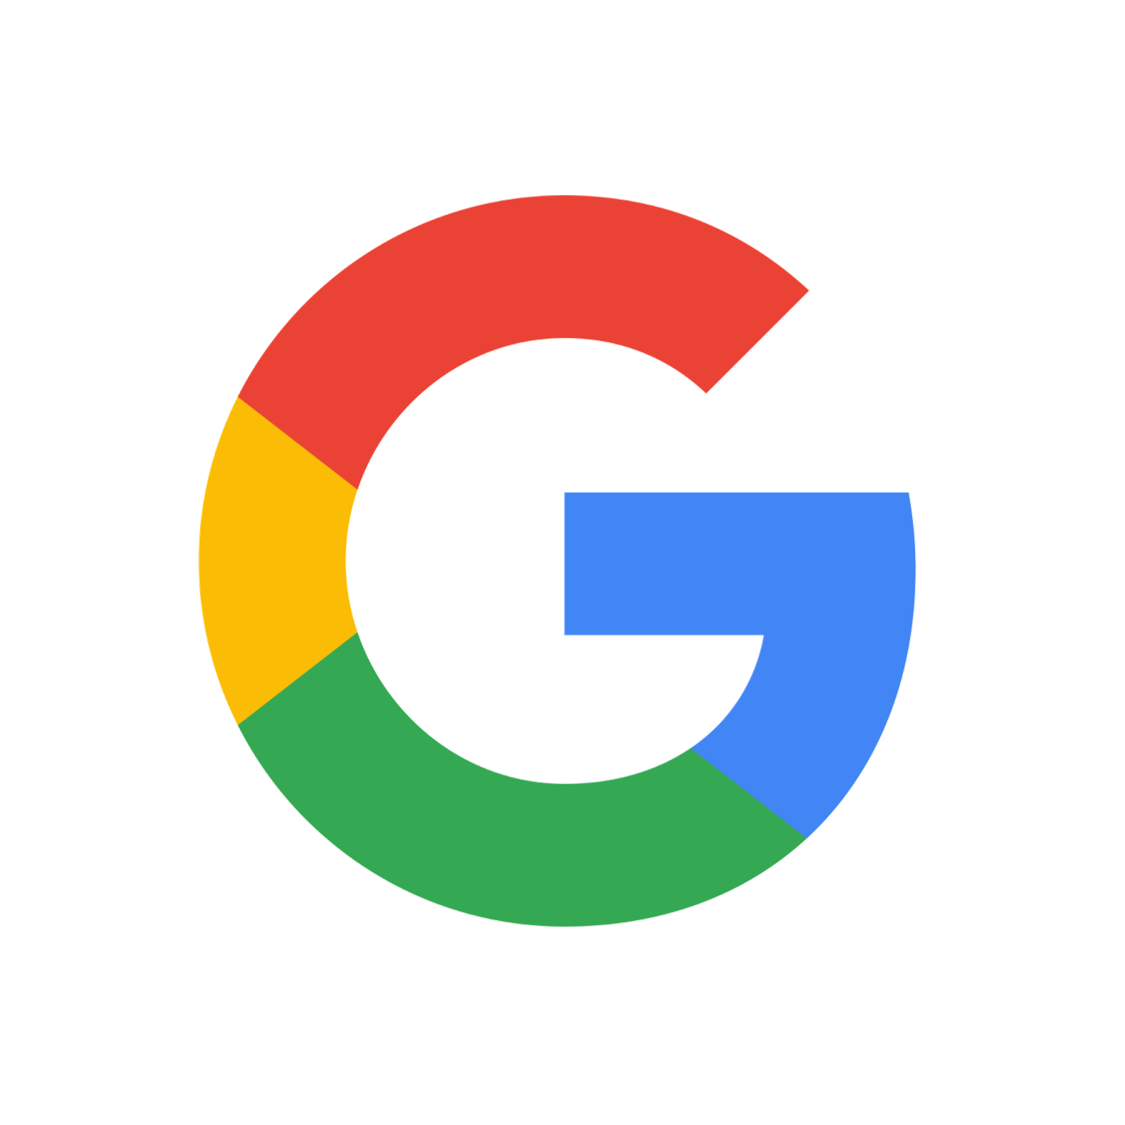 google_PNG19635